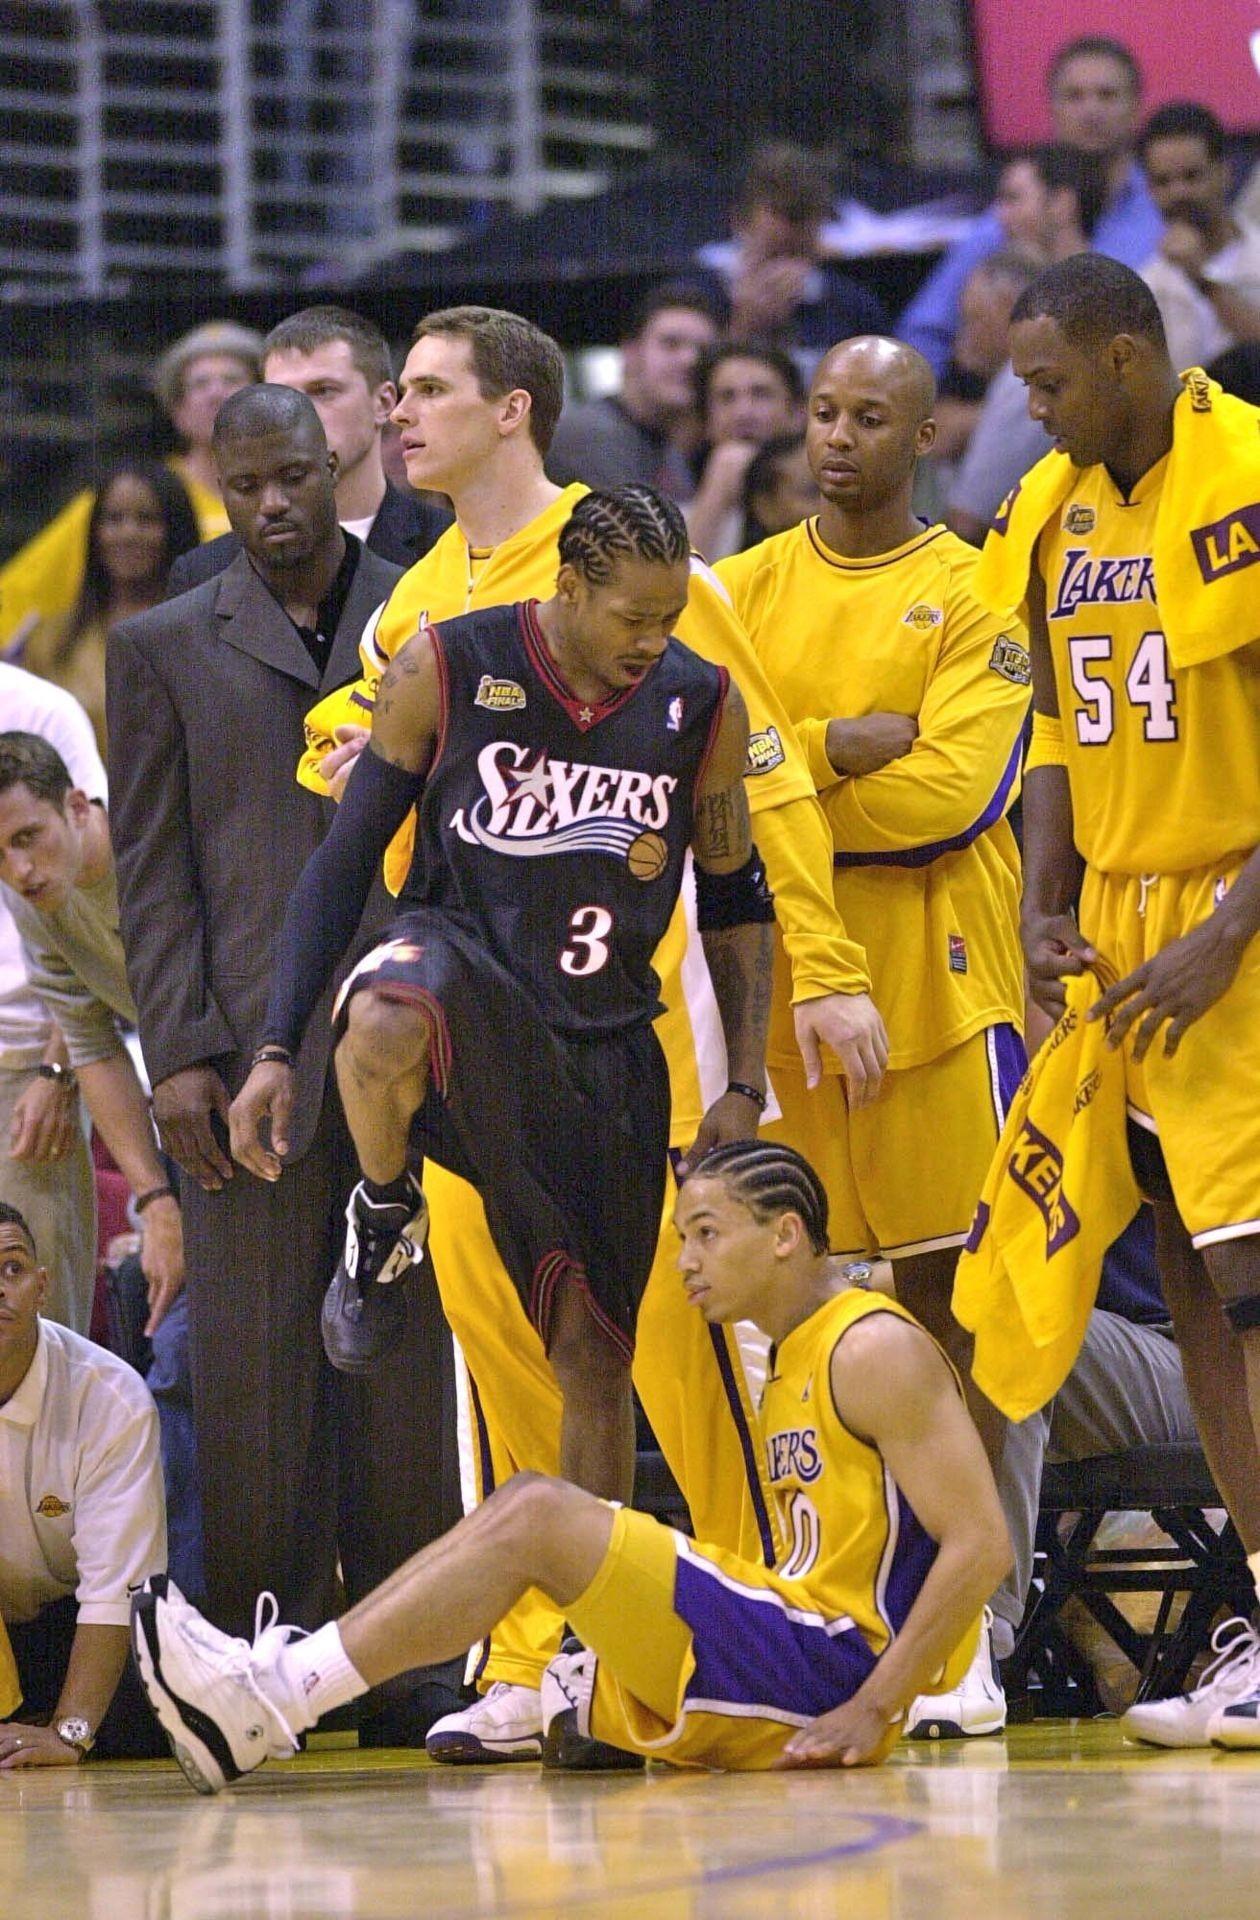 NBA, Basketball, Allen Iverson, Philadelphia 76ers, Philadelphia Wallpapers  HD / Desktop and Mobile Backgrounds